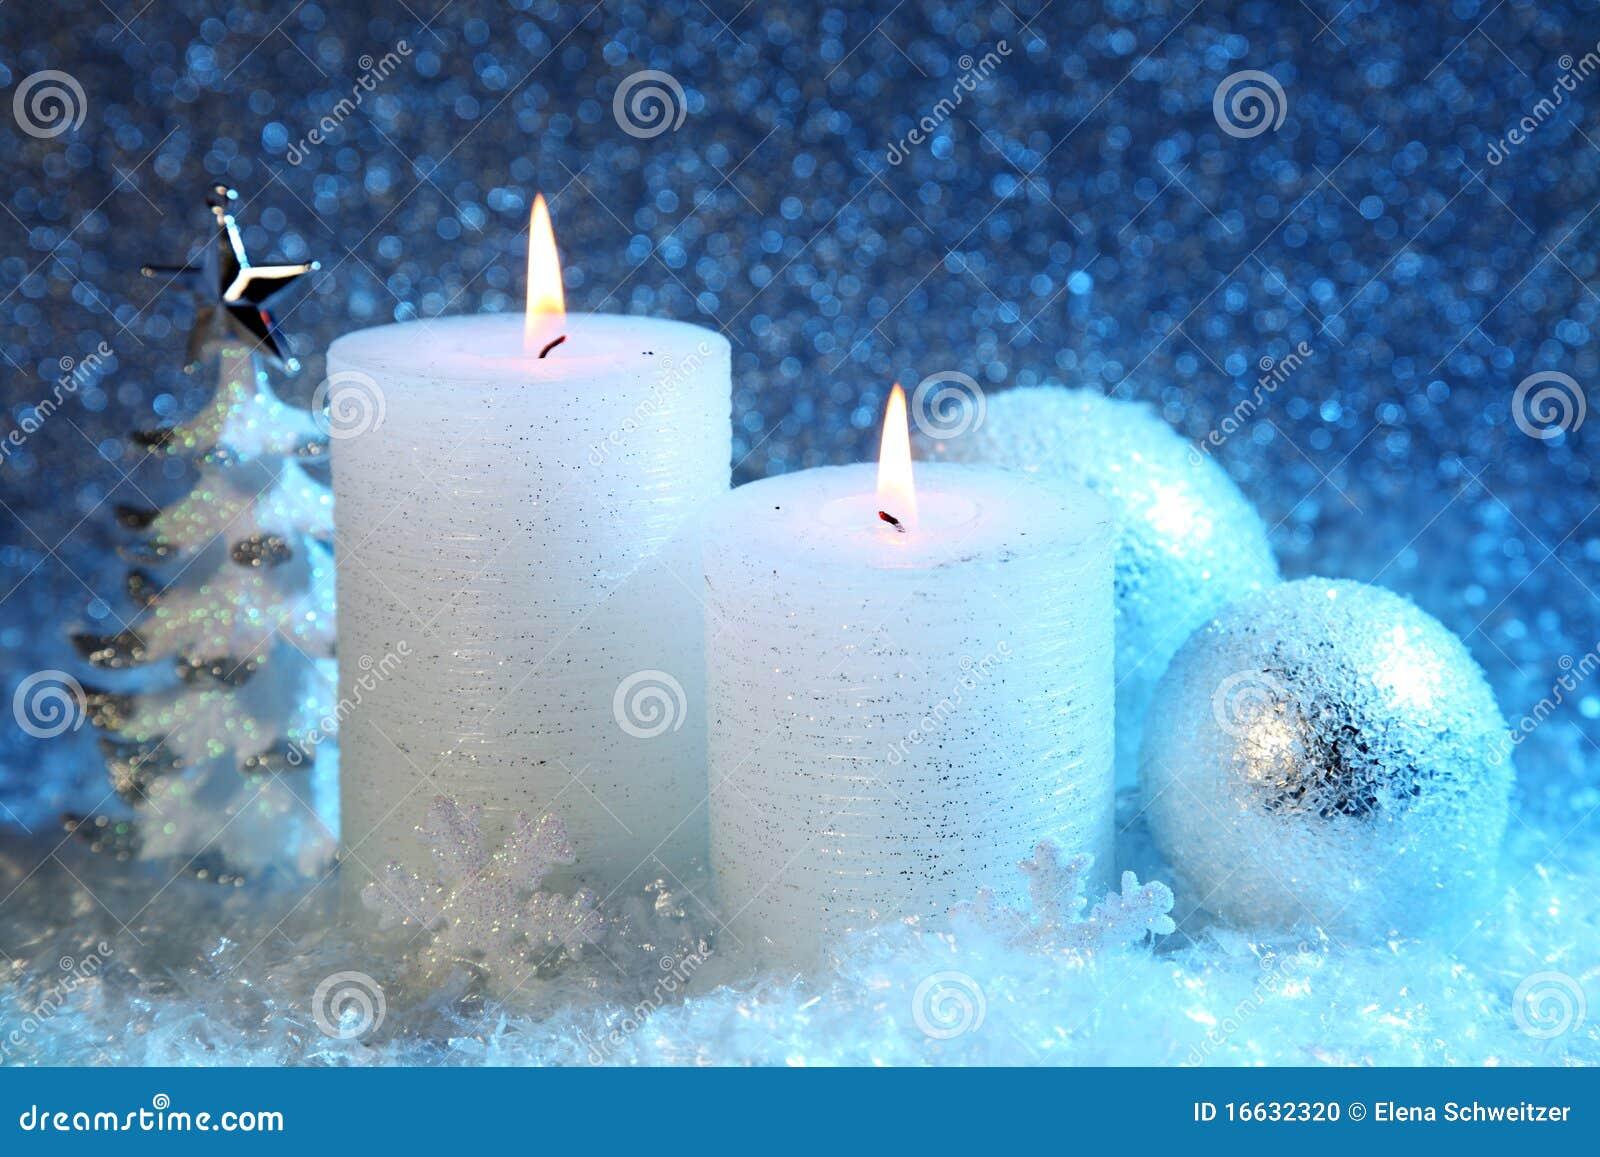 White And Blue Christmas Decoration Stock Photo - Image: 16632320